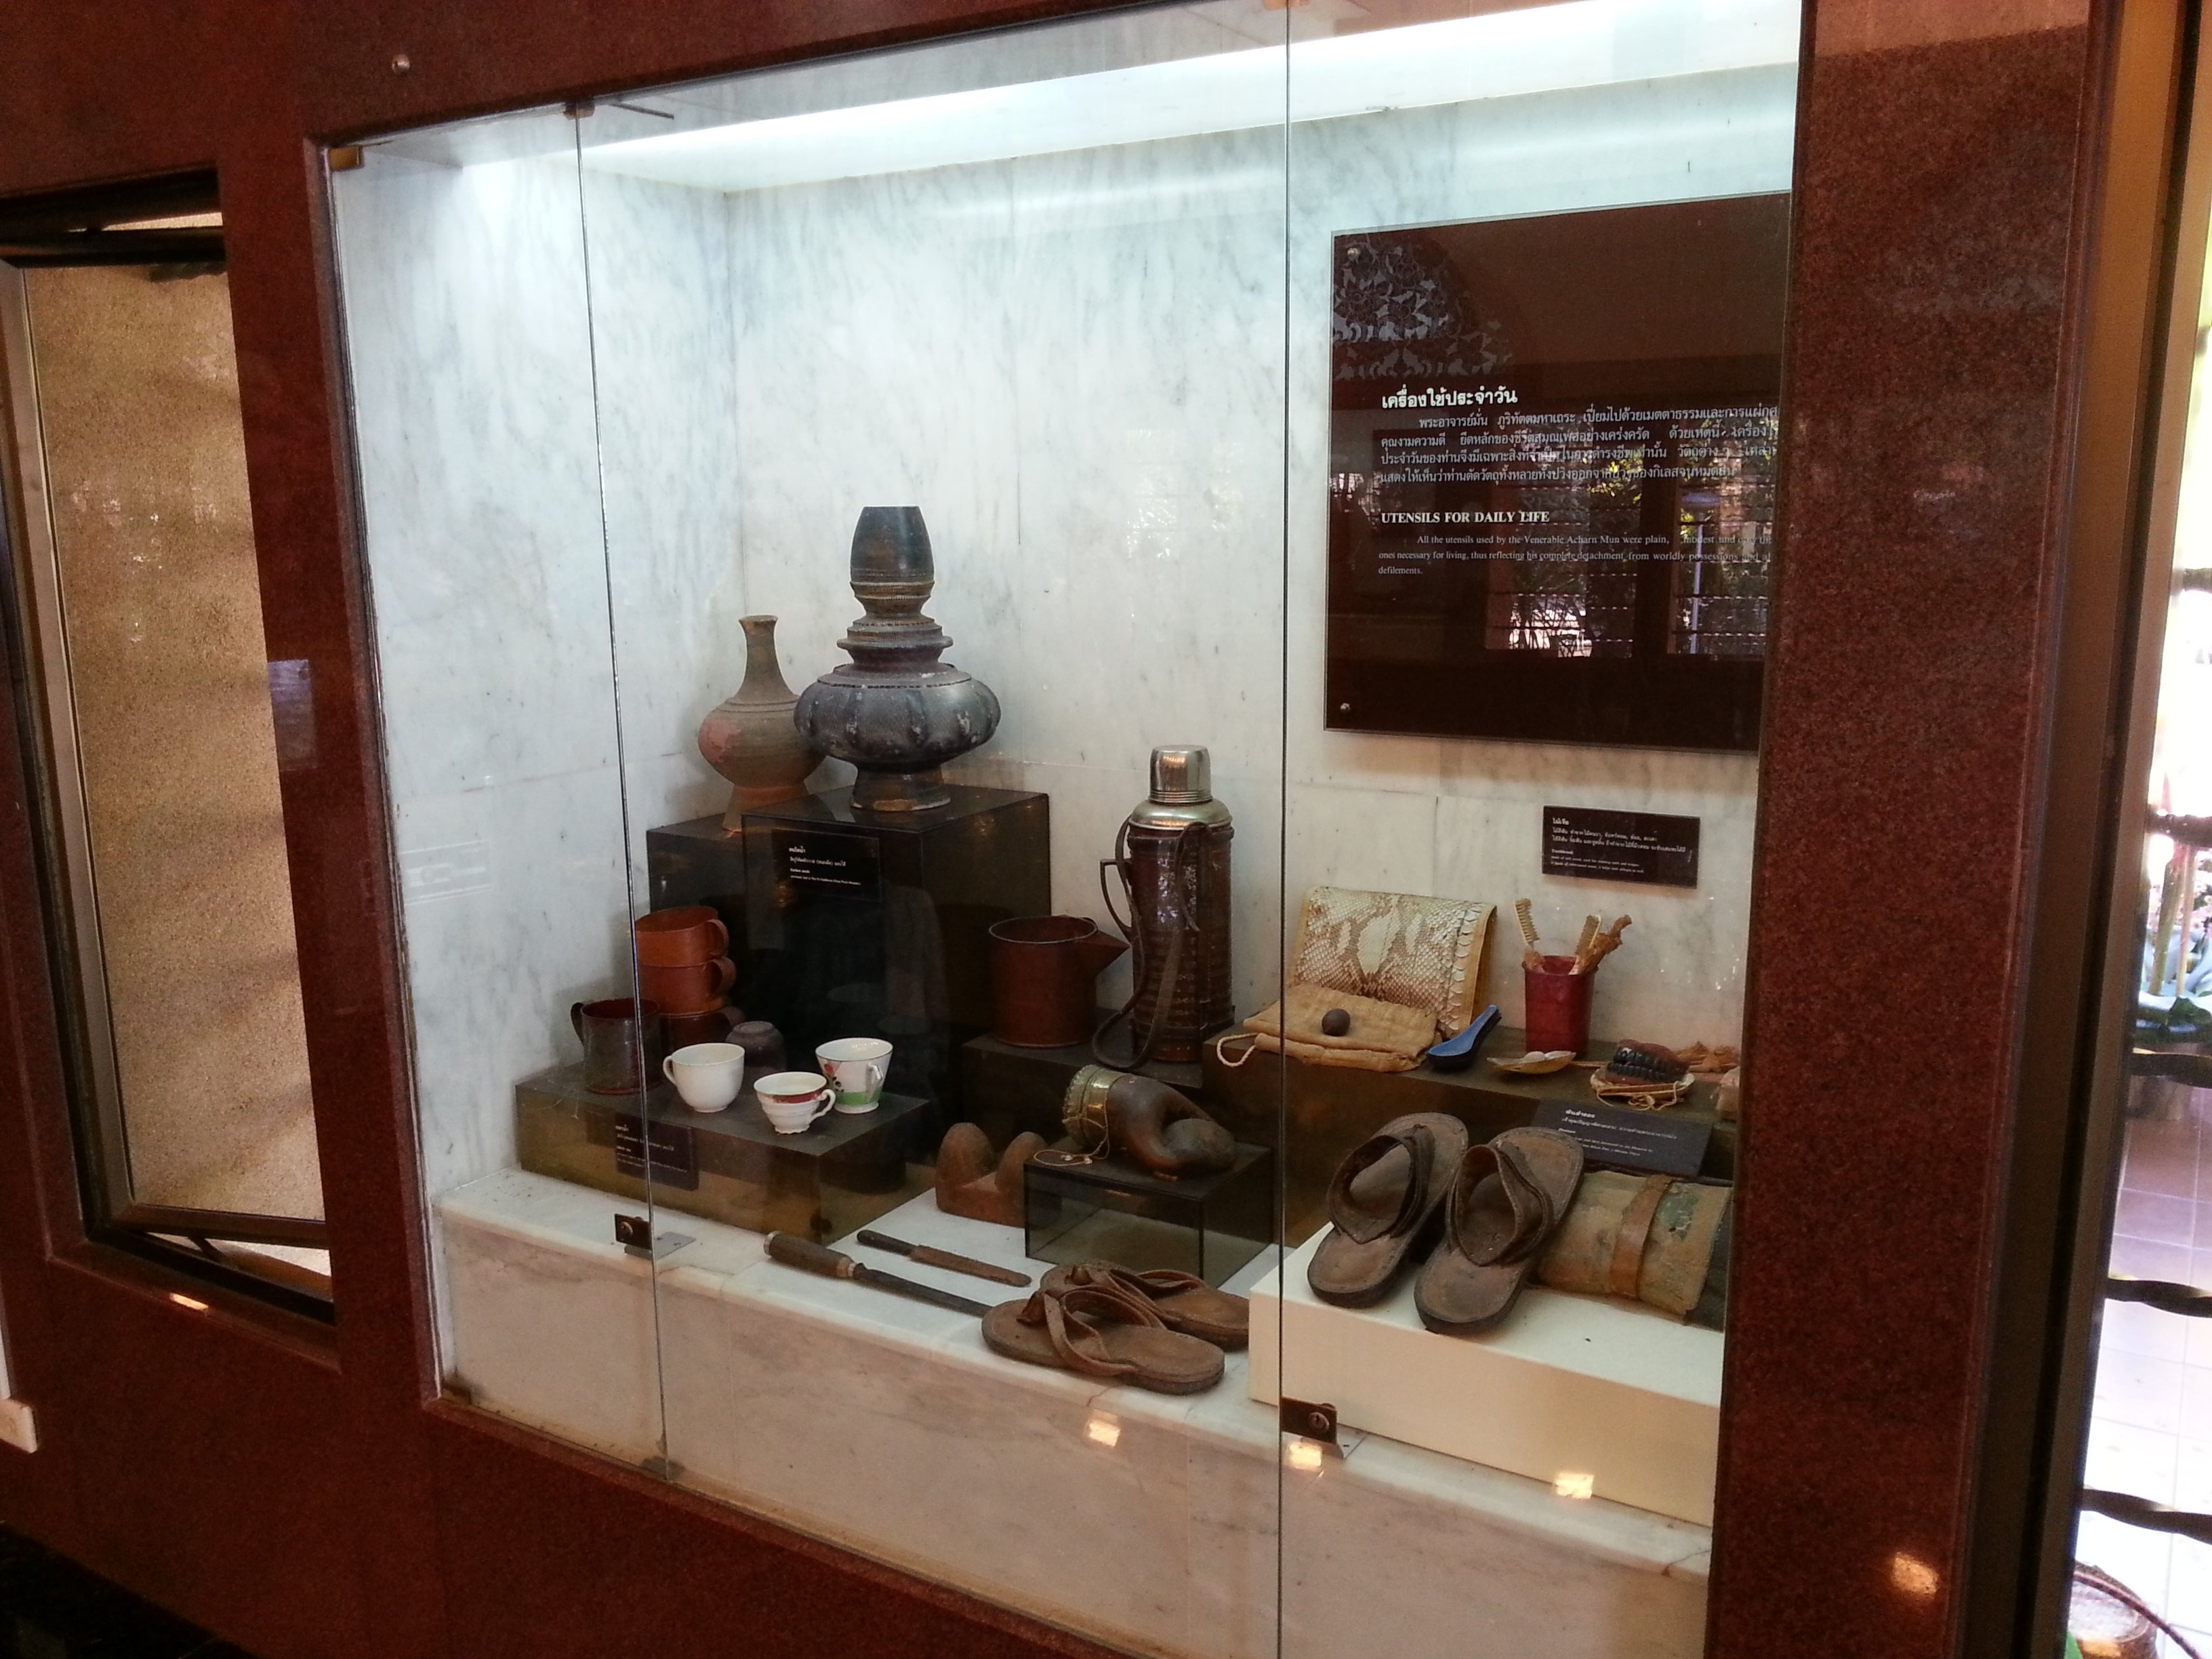 Ajahn Mun's meagre possessions